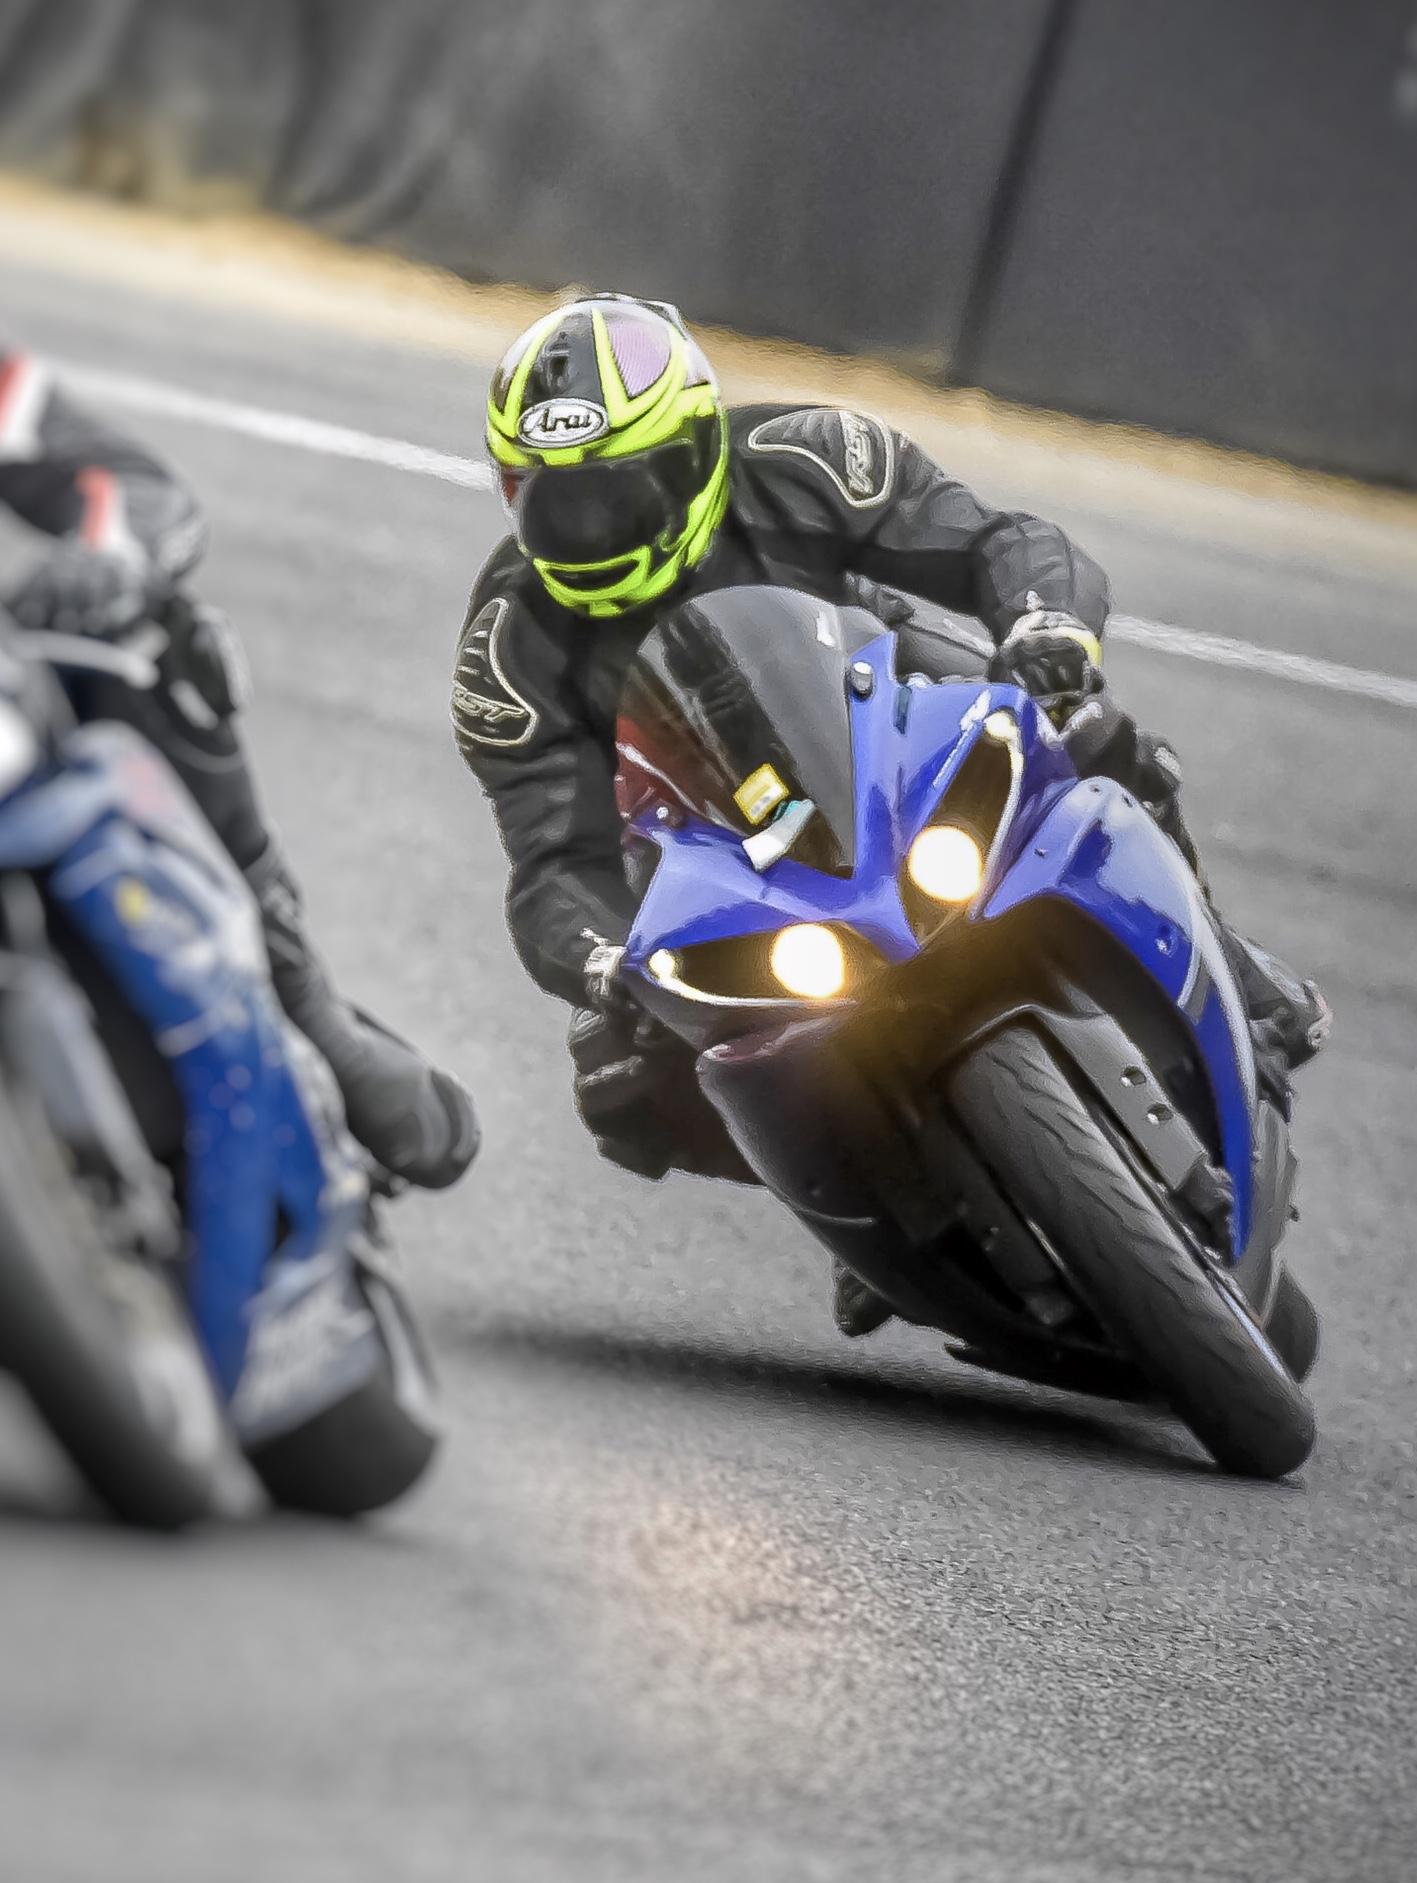 04-10-2018 Brands Hatch trackday photographs - VeloxRacing